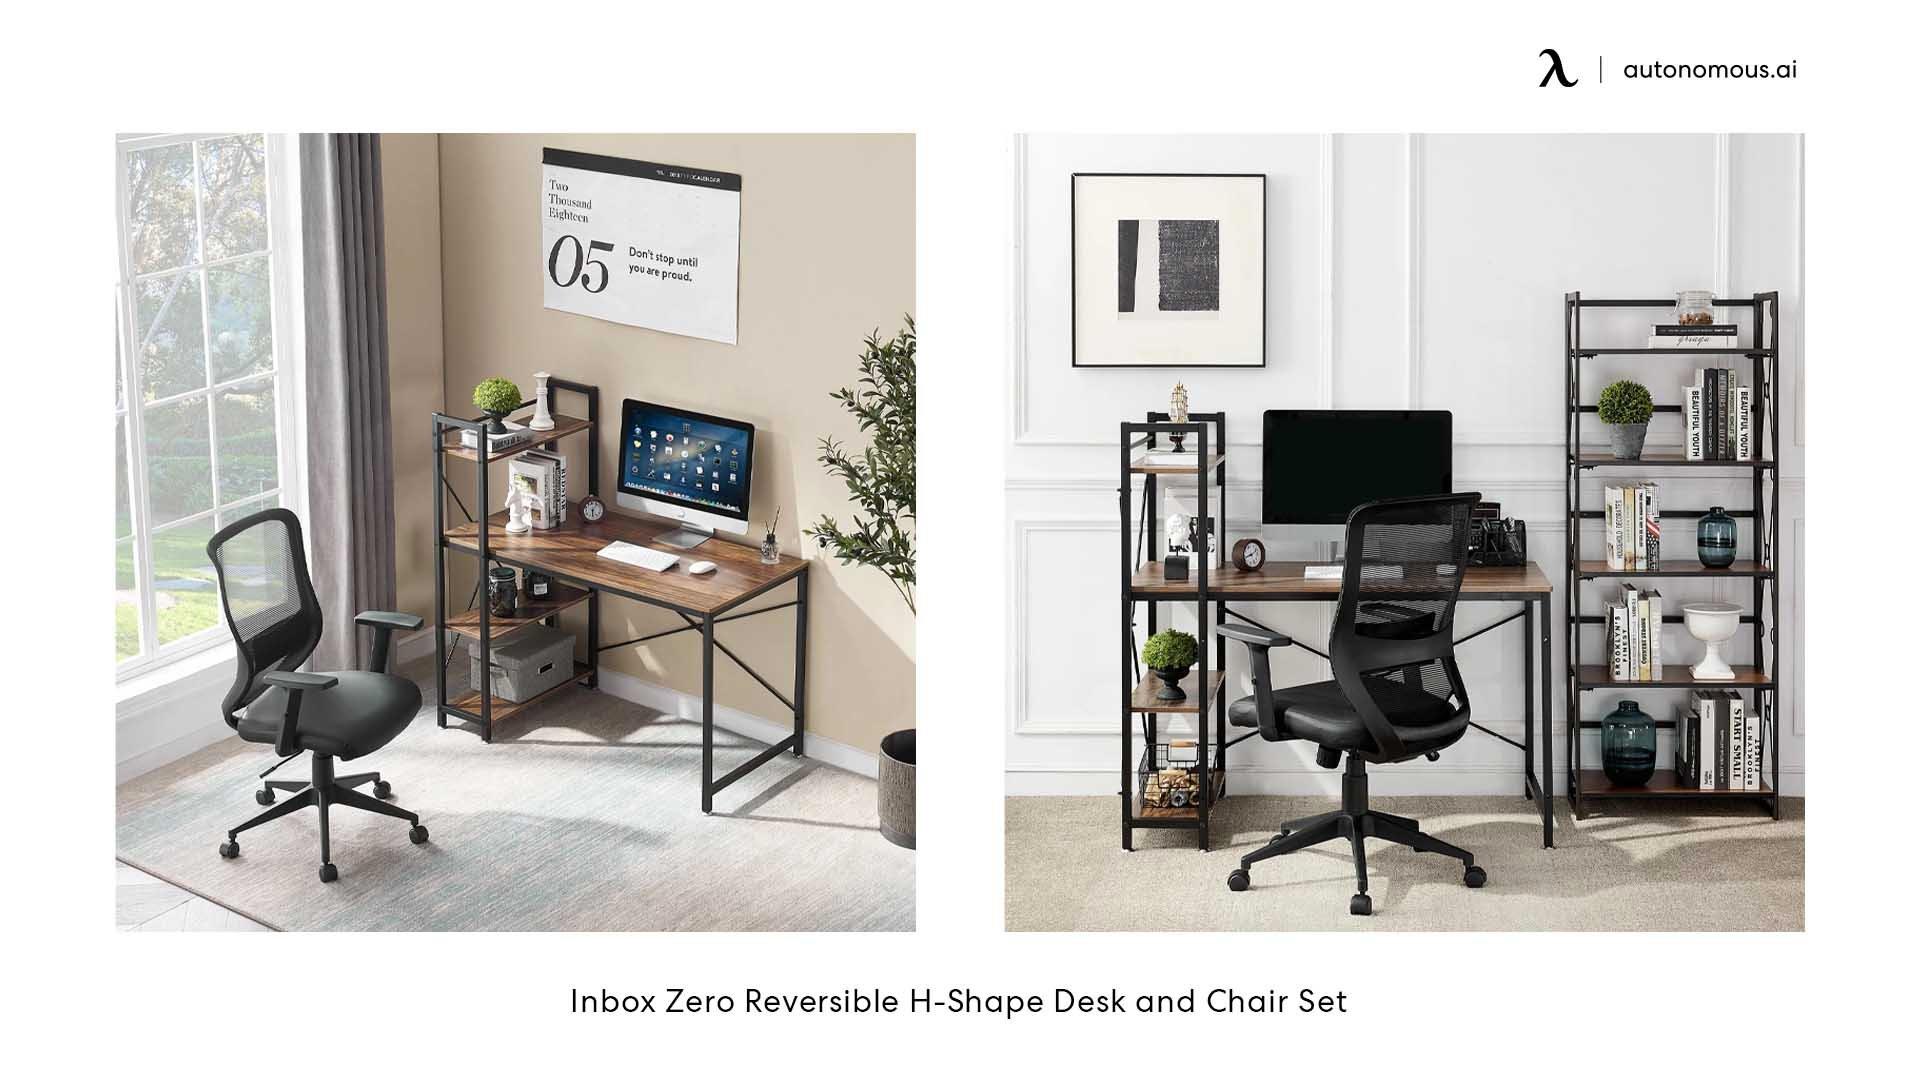 Inbox Zero Reversible H-Shape Desk and Chair Set